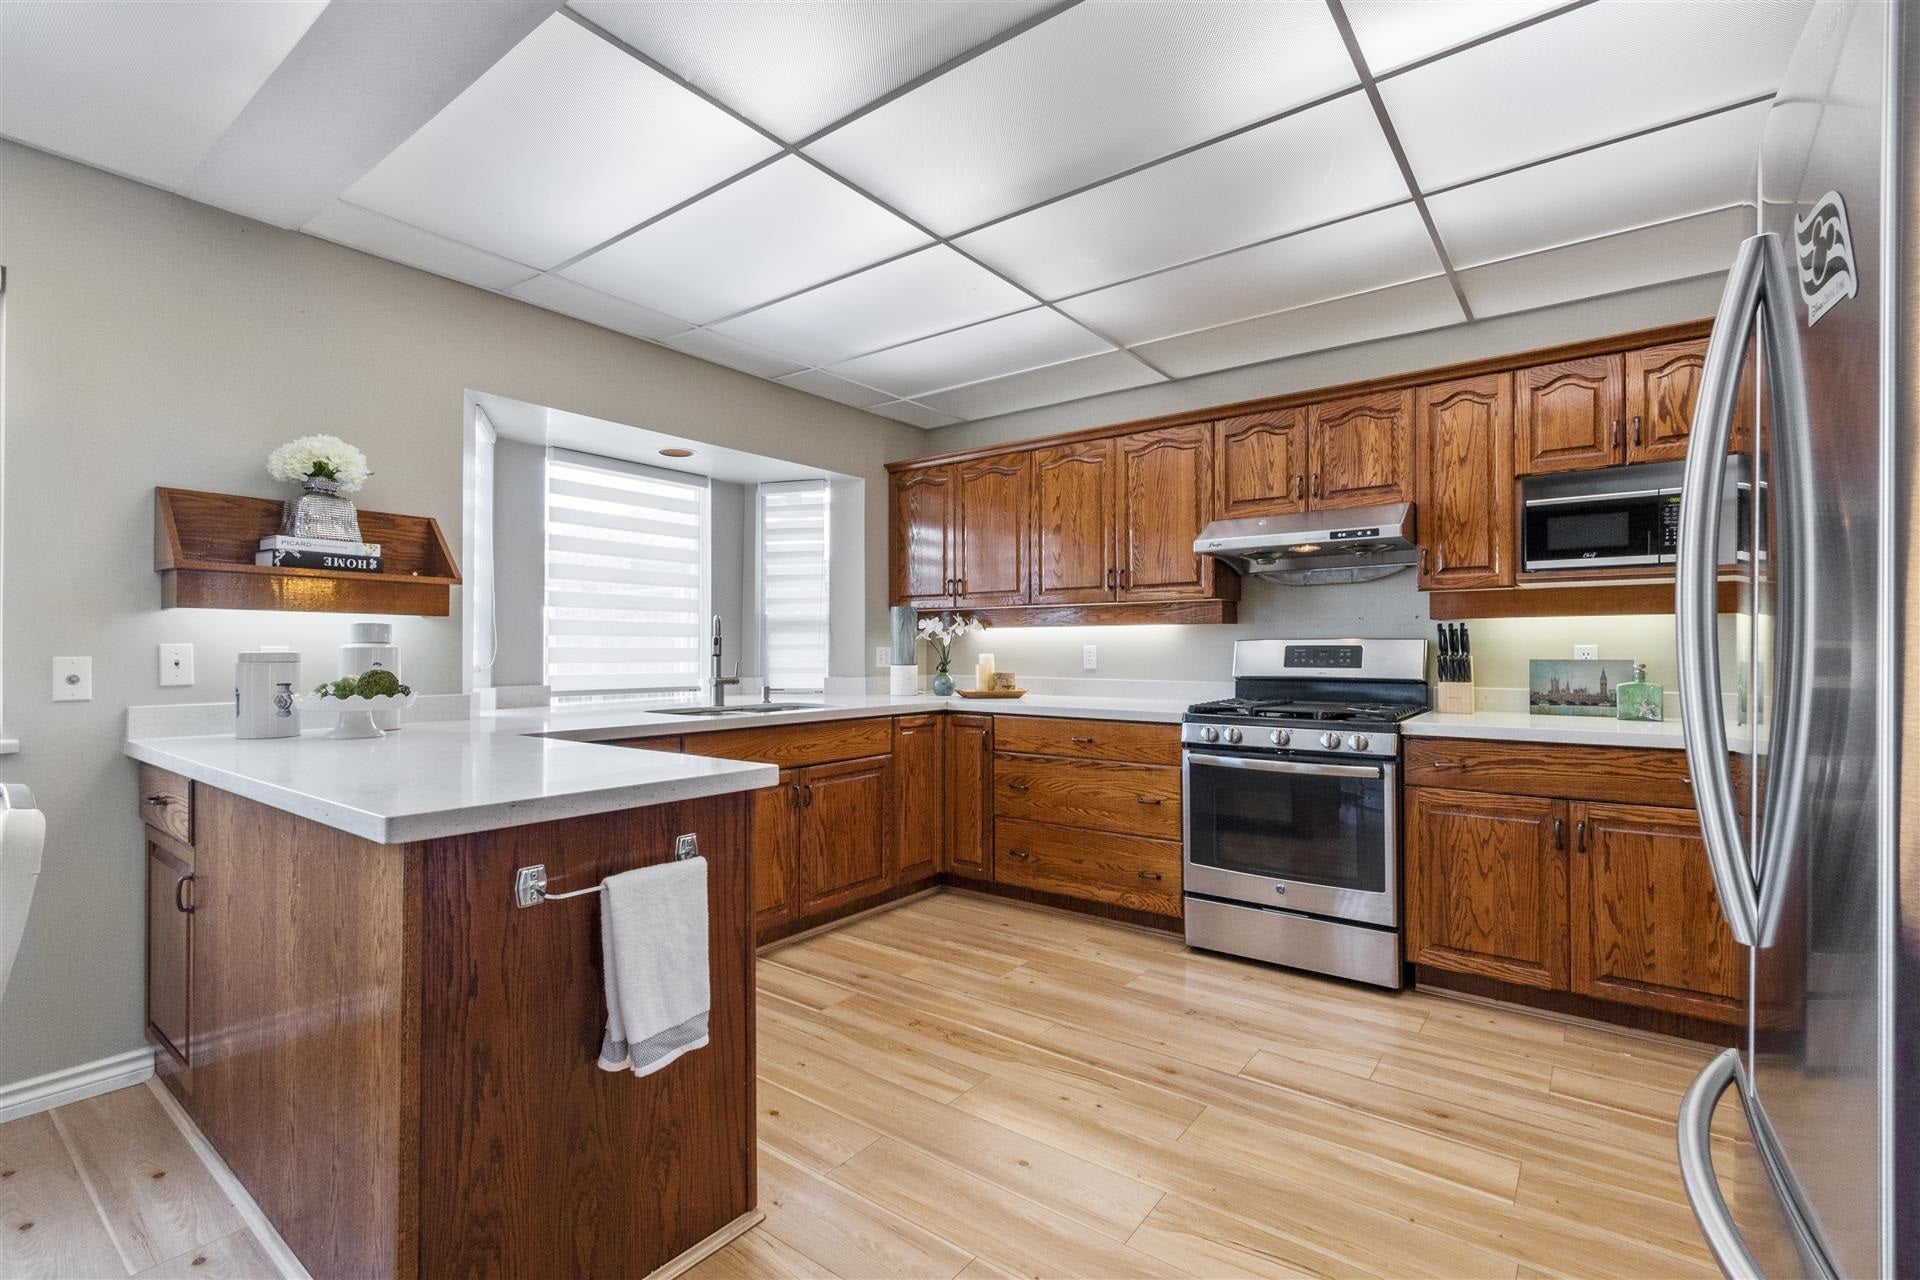 3631 GEORGIA STREET - Steveston Village House/Single Family for sale, 3 Bedrooms (R2623894) - #6